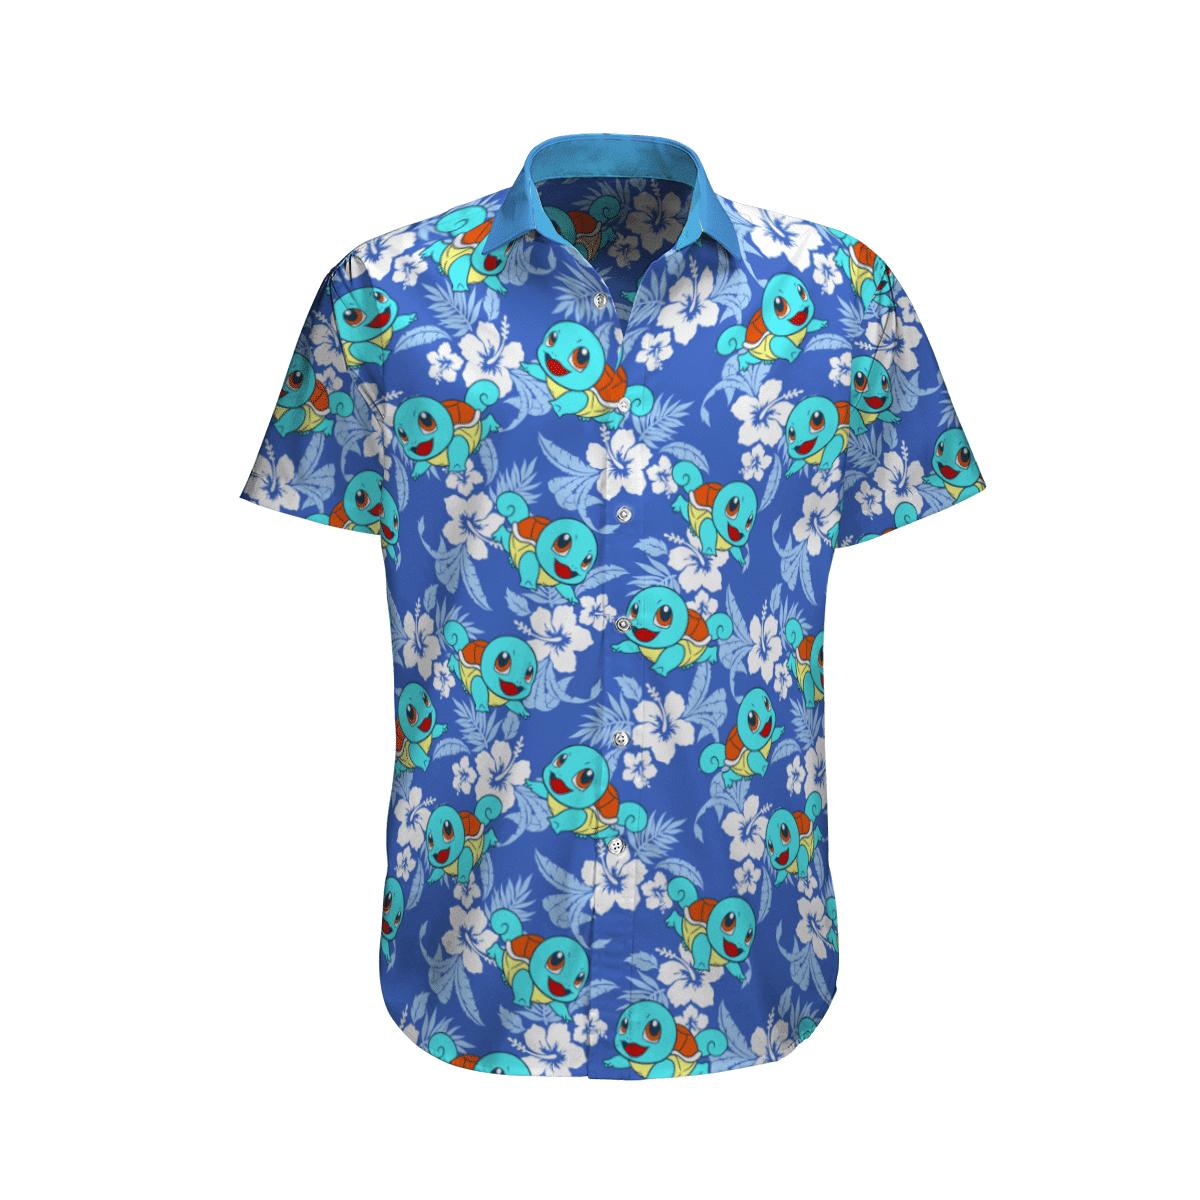 Pokemon Squirtle Tropical Beach Hawaiian Shirt And Shorts